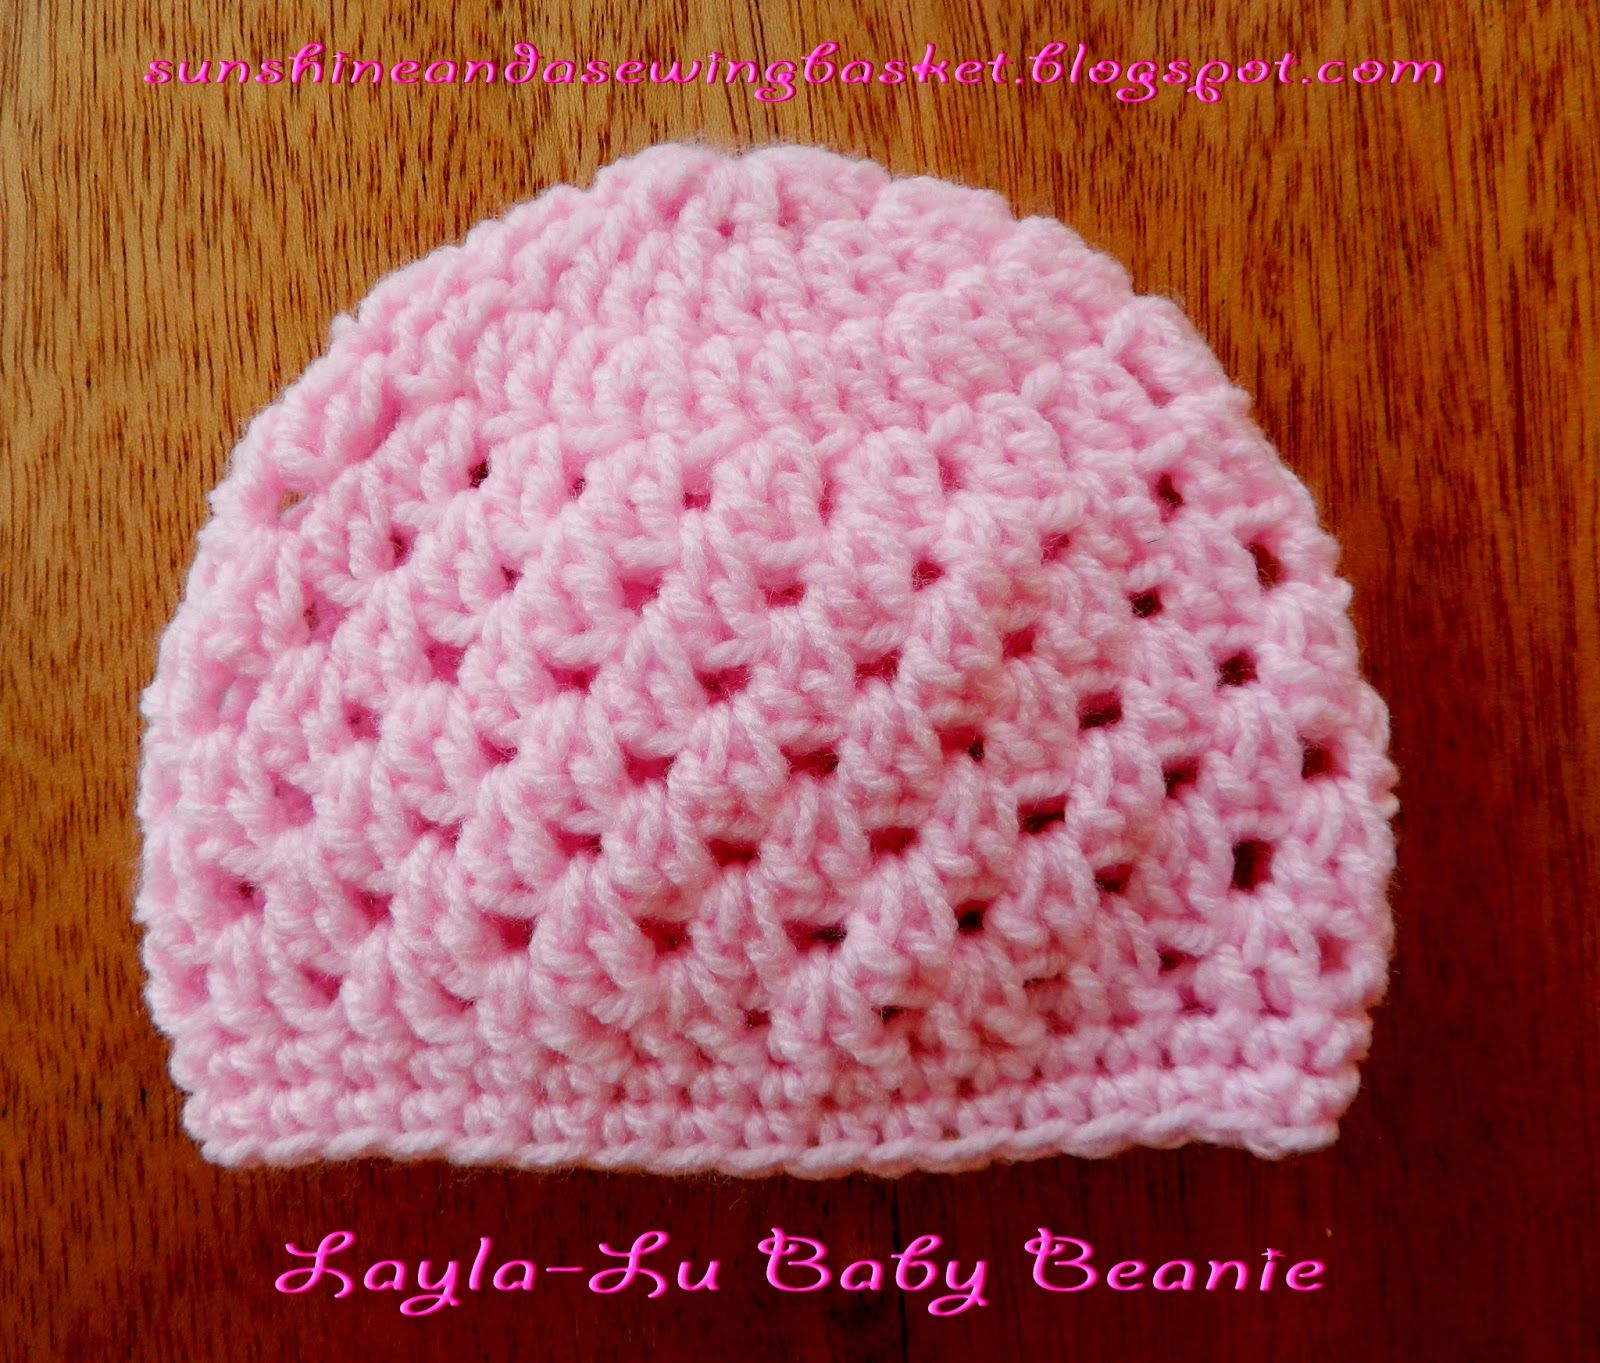 sunshine and a sewing basket: Layla-Lu beanie-Baby Beanie tutorial ...